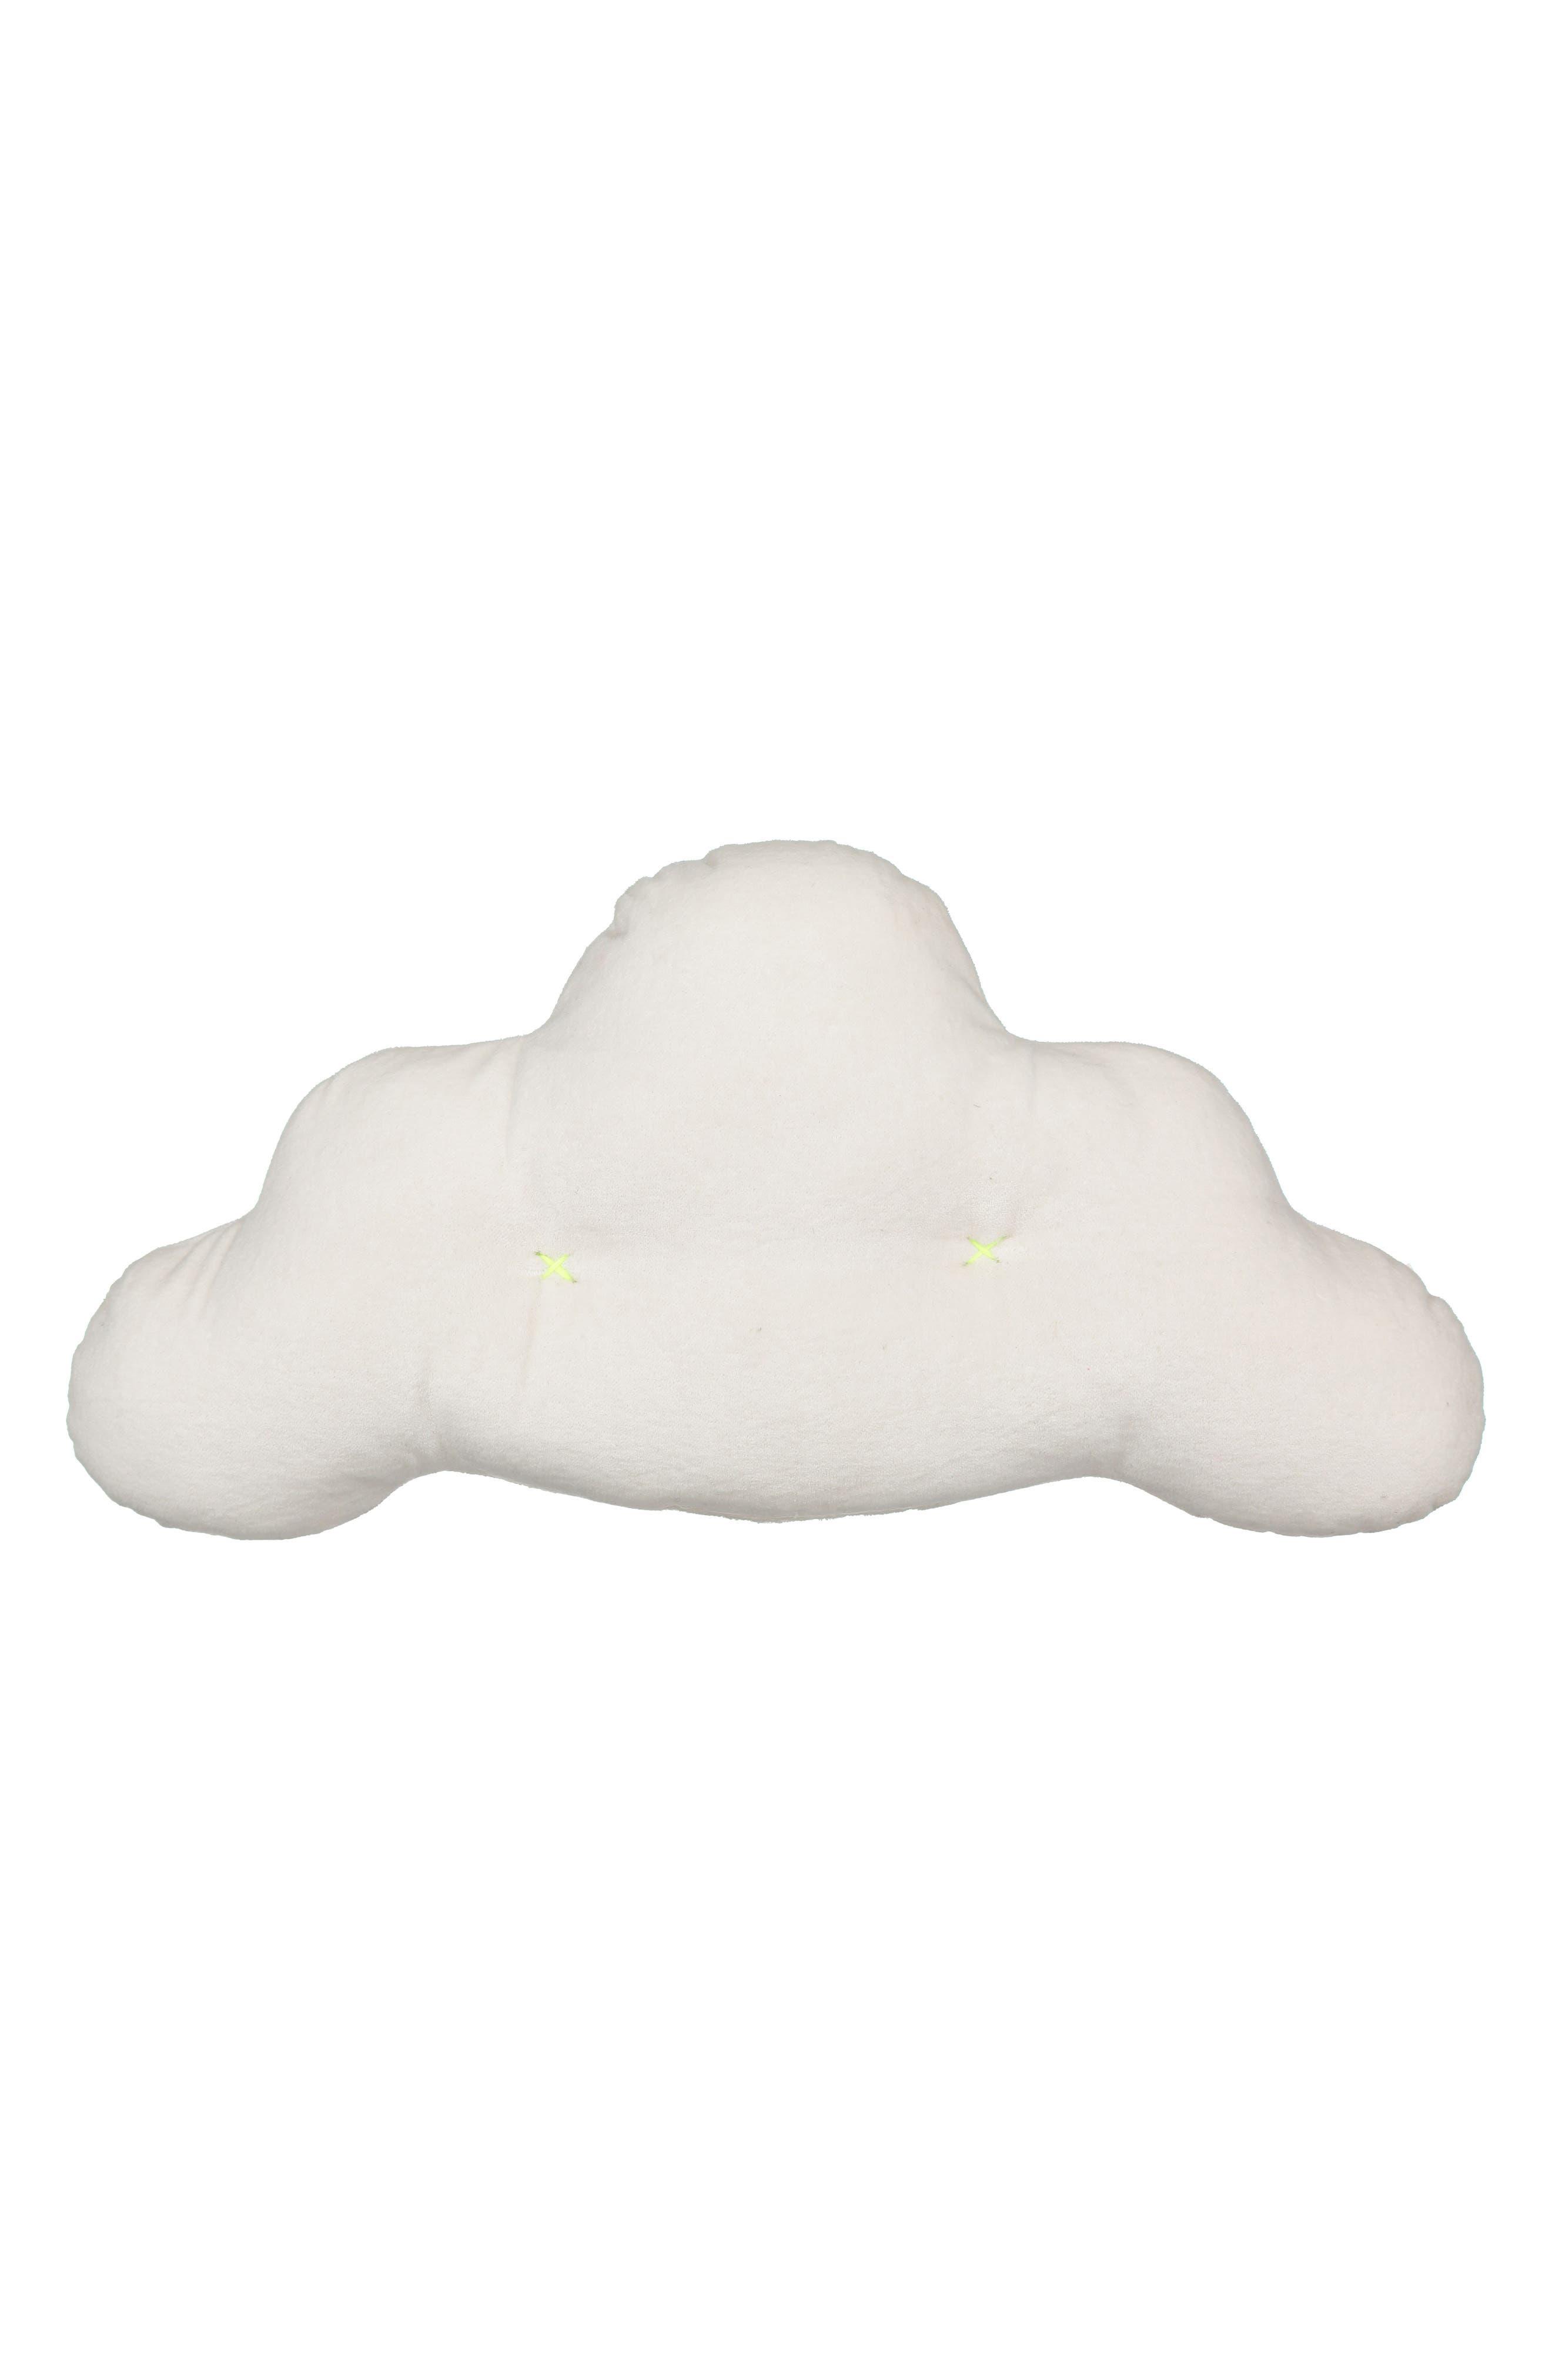 Velvet Cloud Pillow,                         Main,                         color, White